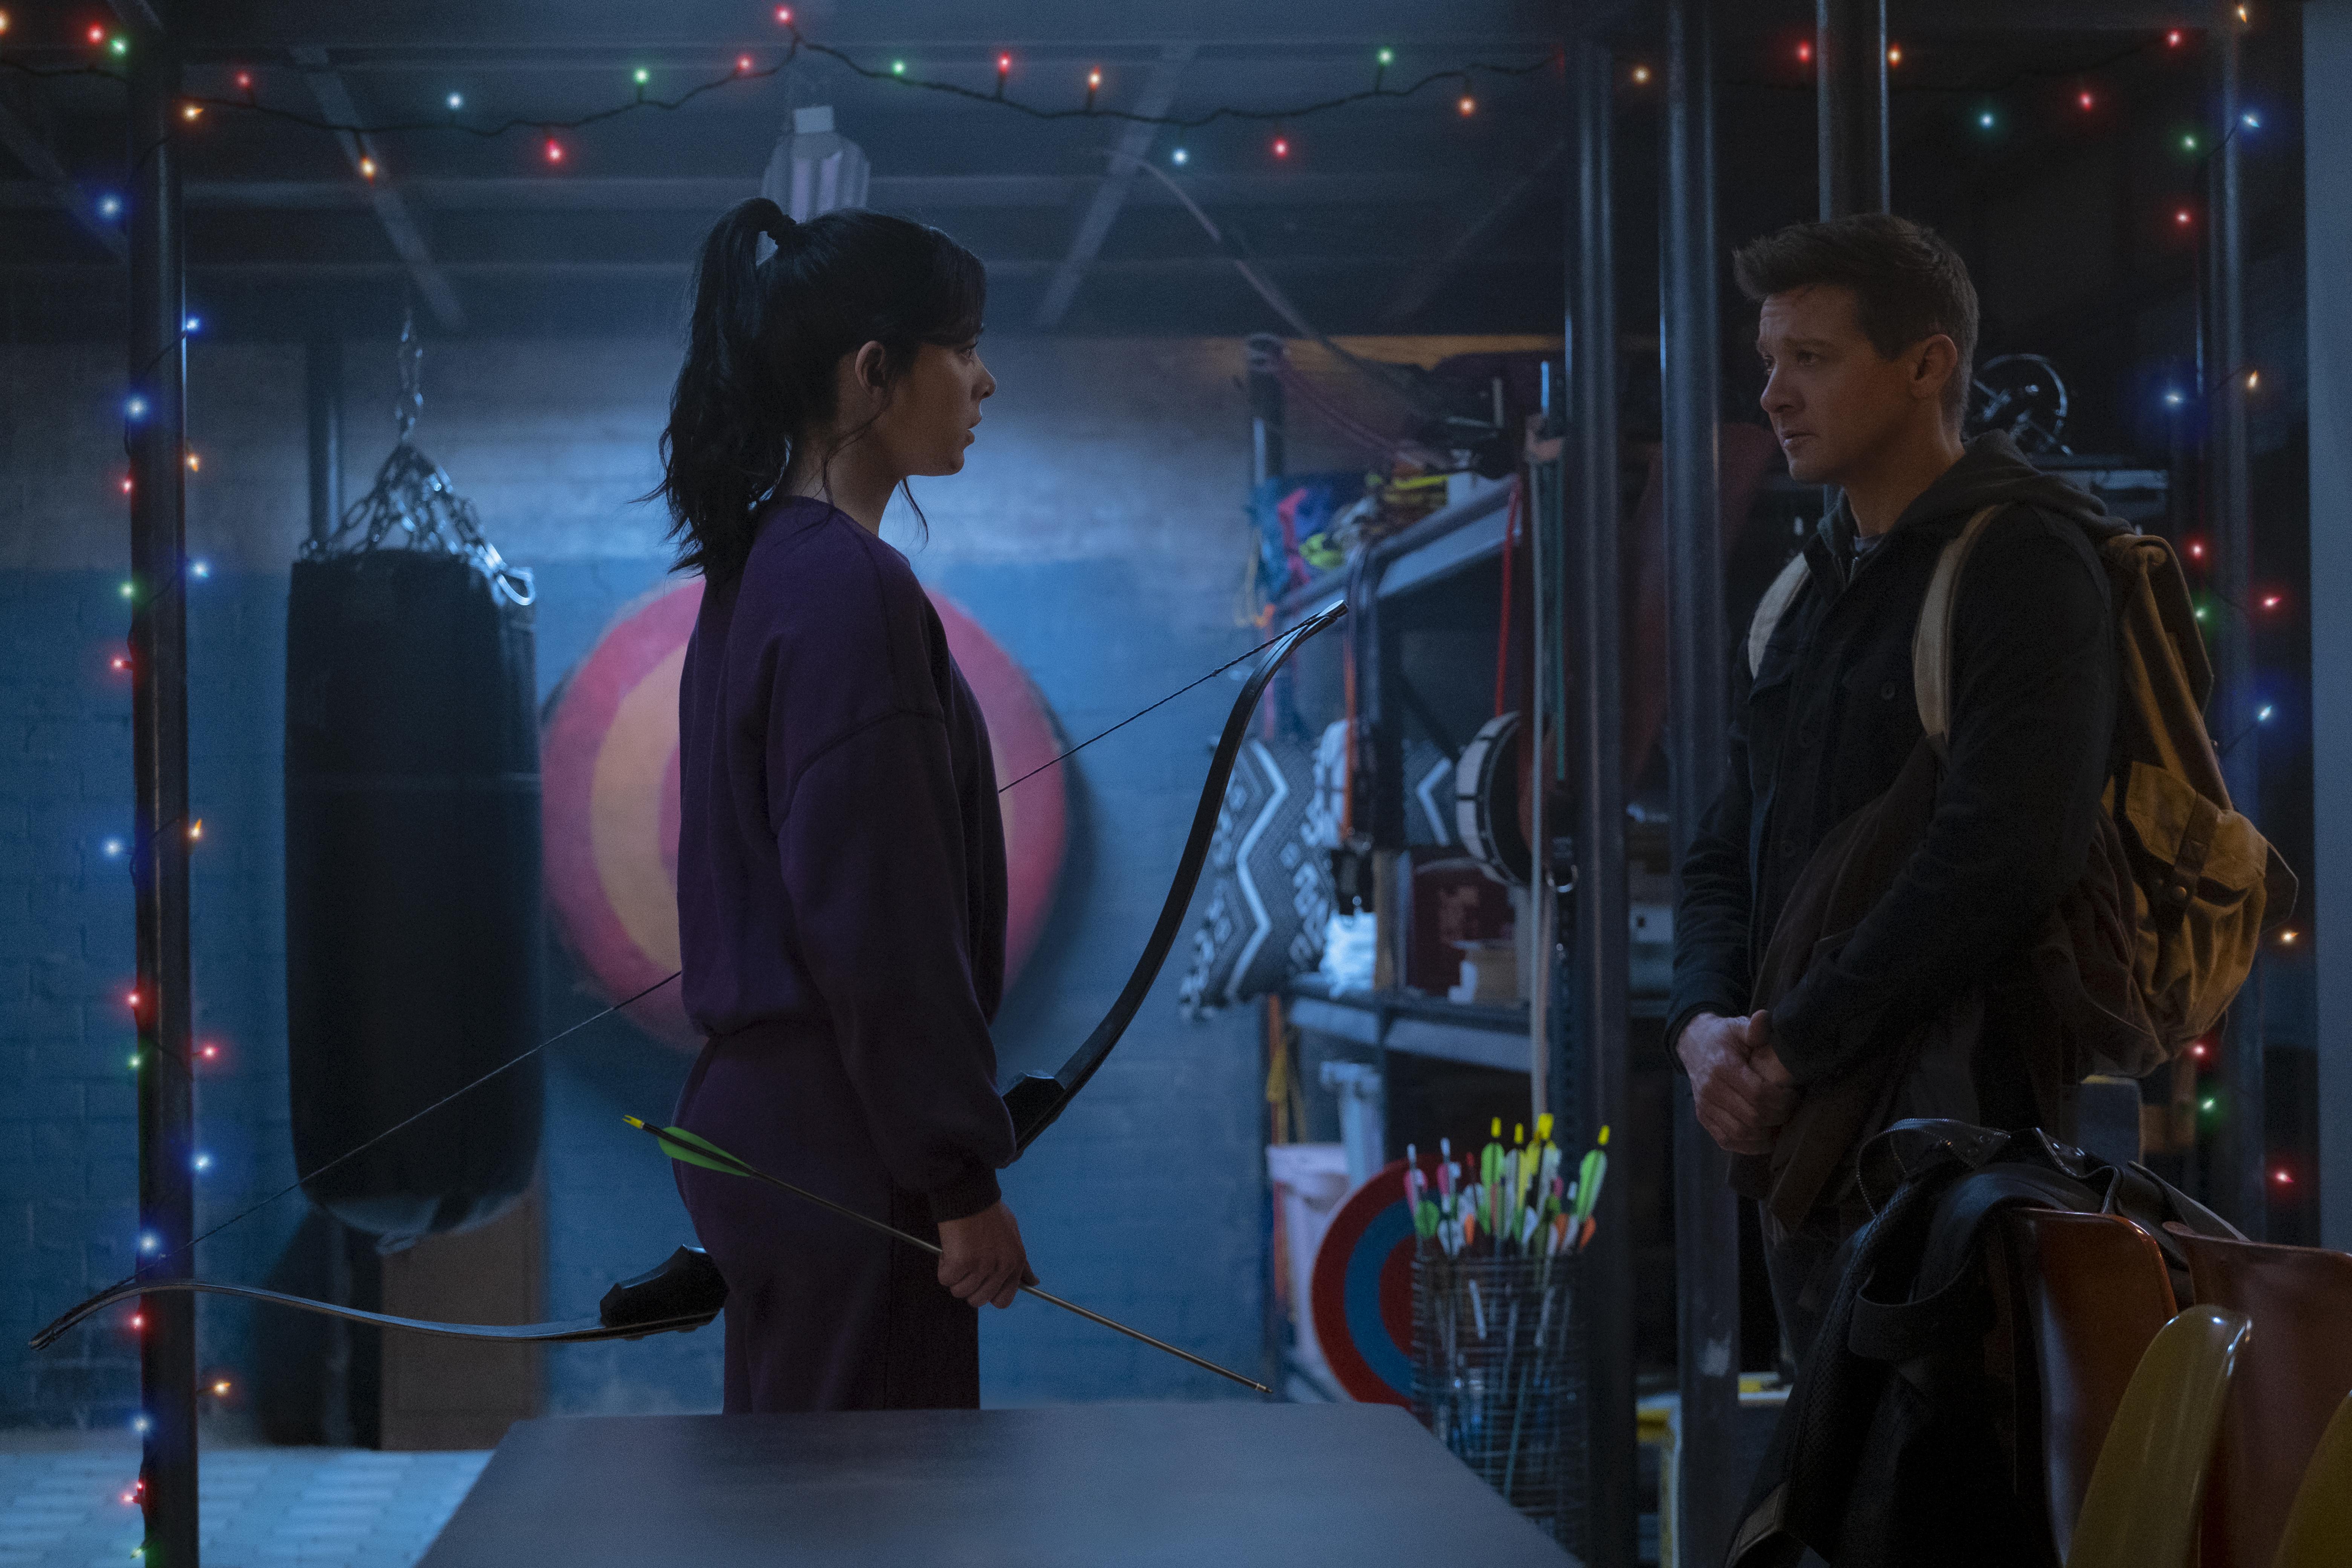 Kate Bishop and Hawkeye/Clint Barton in Marvel Studios' HAWKEYE on Disney+.